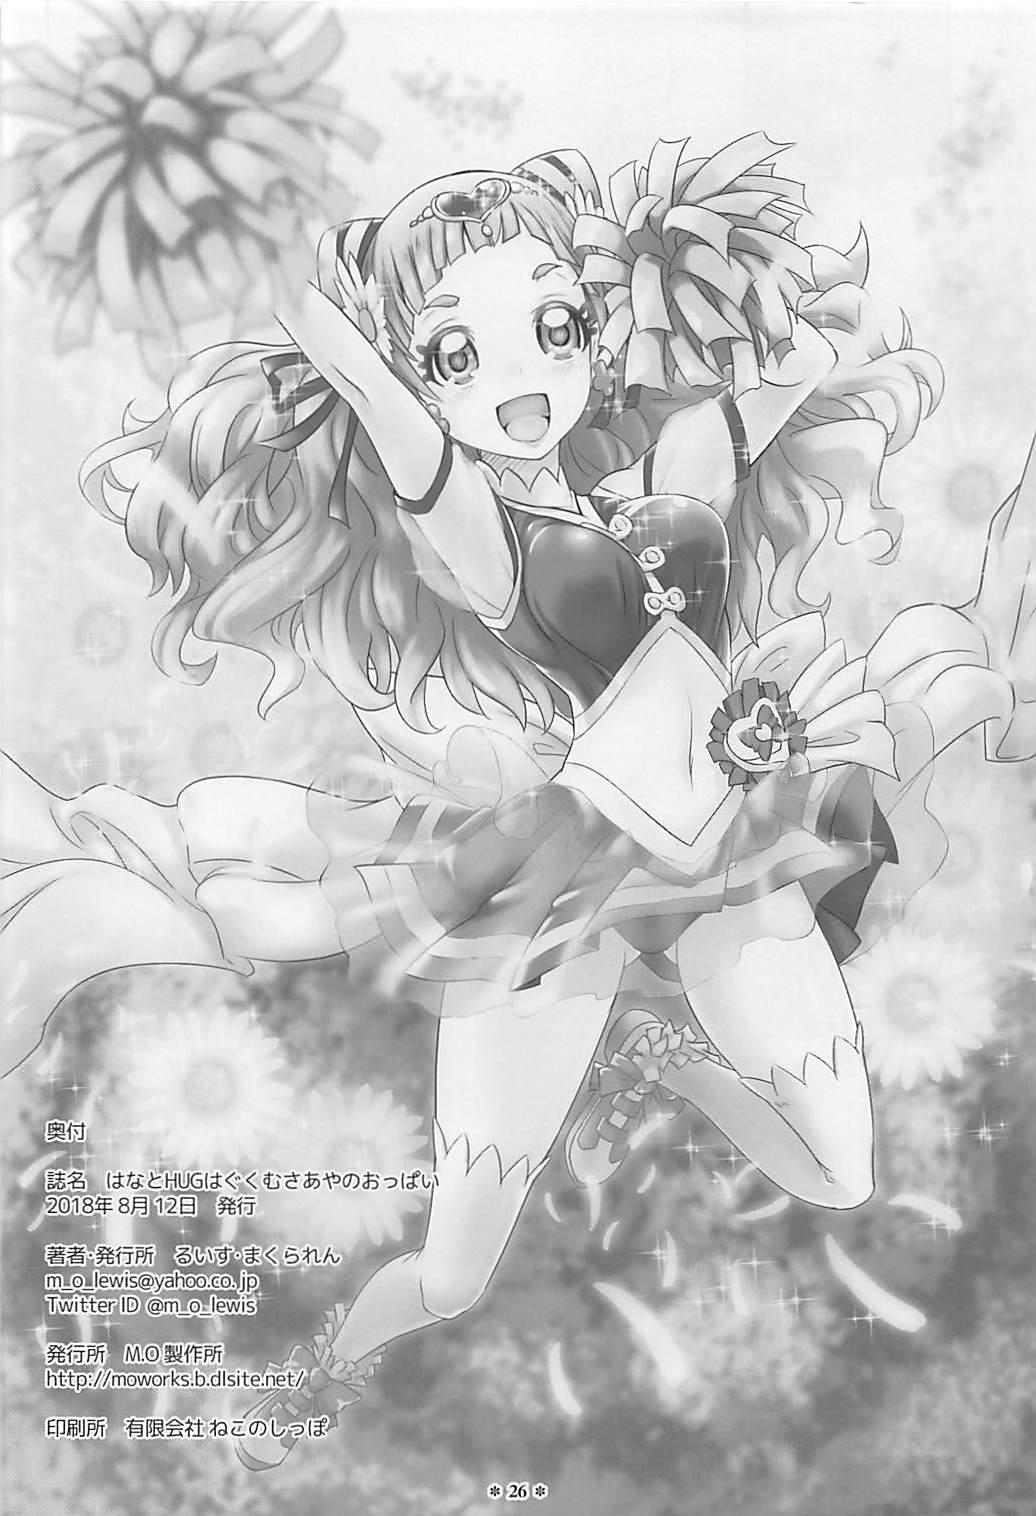 Hana to HUG Hagukumu Saaya no Oppai 24